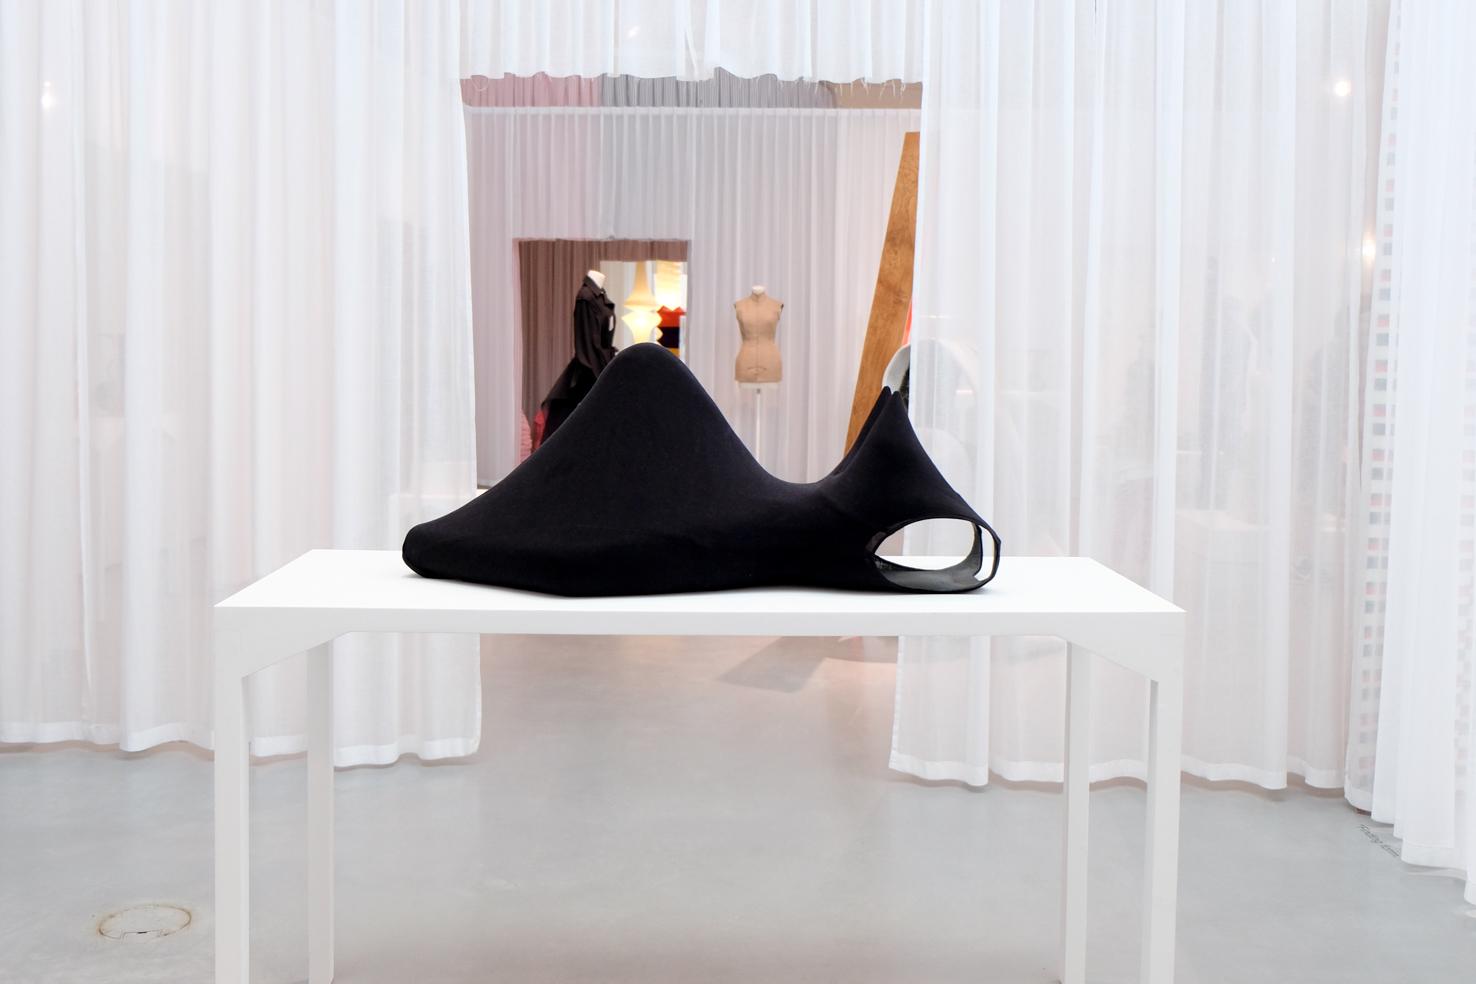 19 Jean Paul Gaultier Cone Dress 19831984